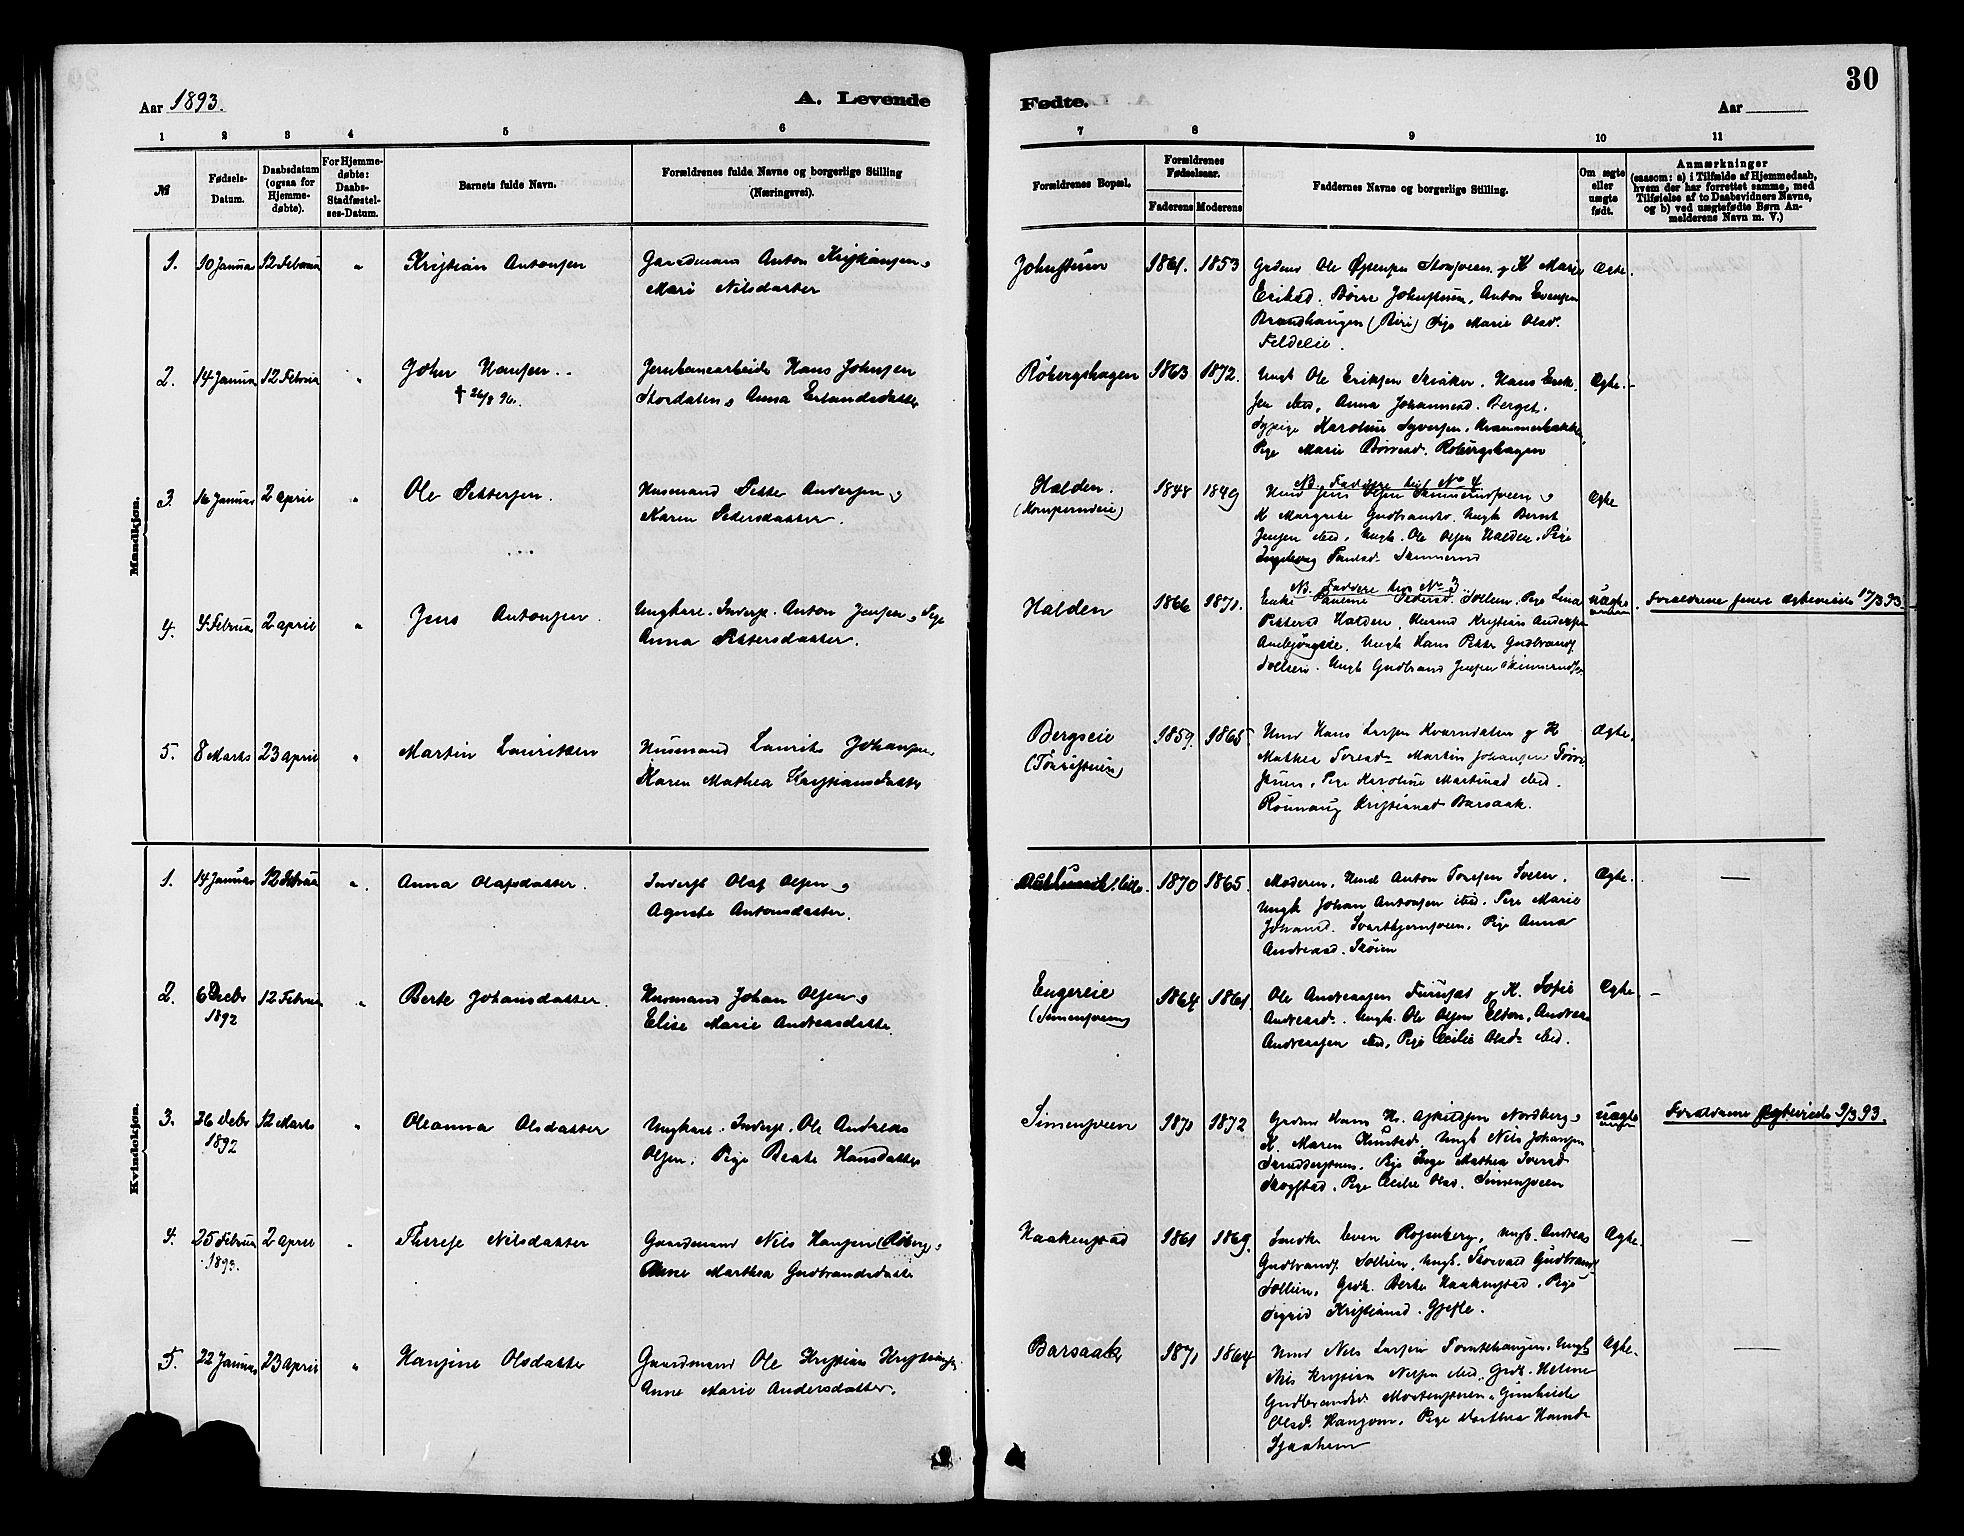 SAH, Nordre Land prestekontor, Ministerialbok nr. 3, 1882-1896, s. 30